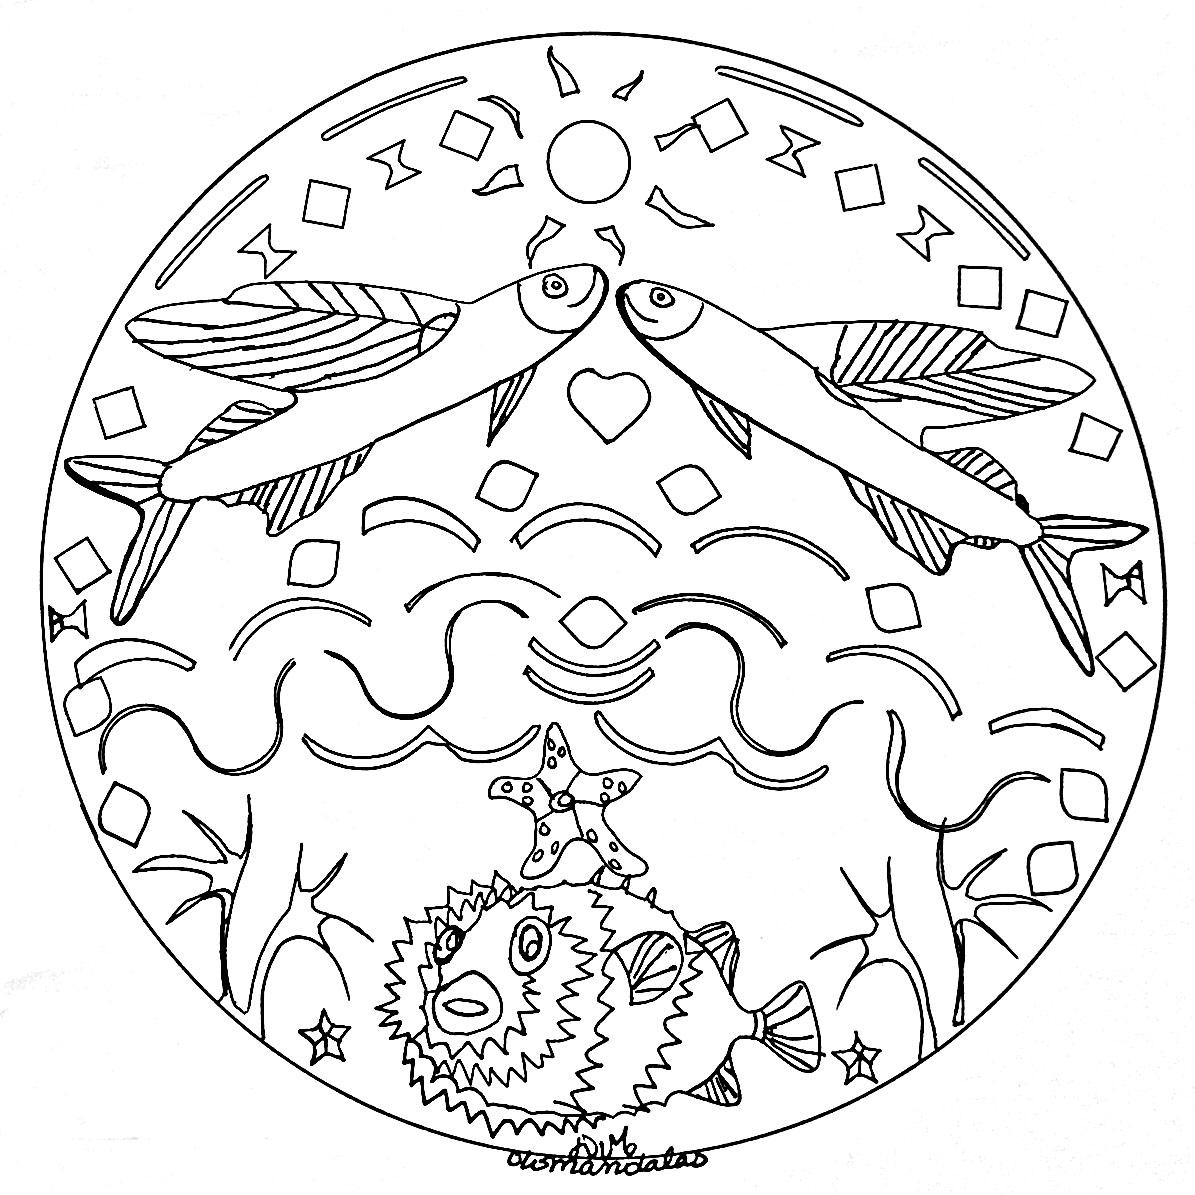 Malbuch Fur Erwachsene  : Mandalas - 219